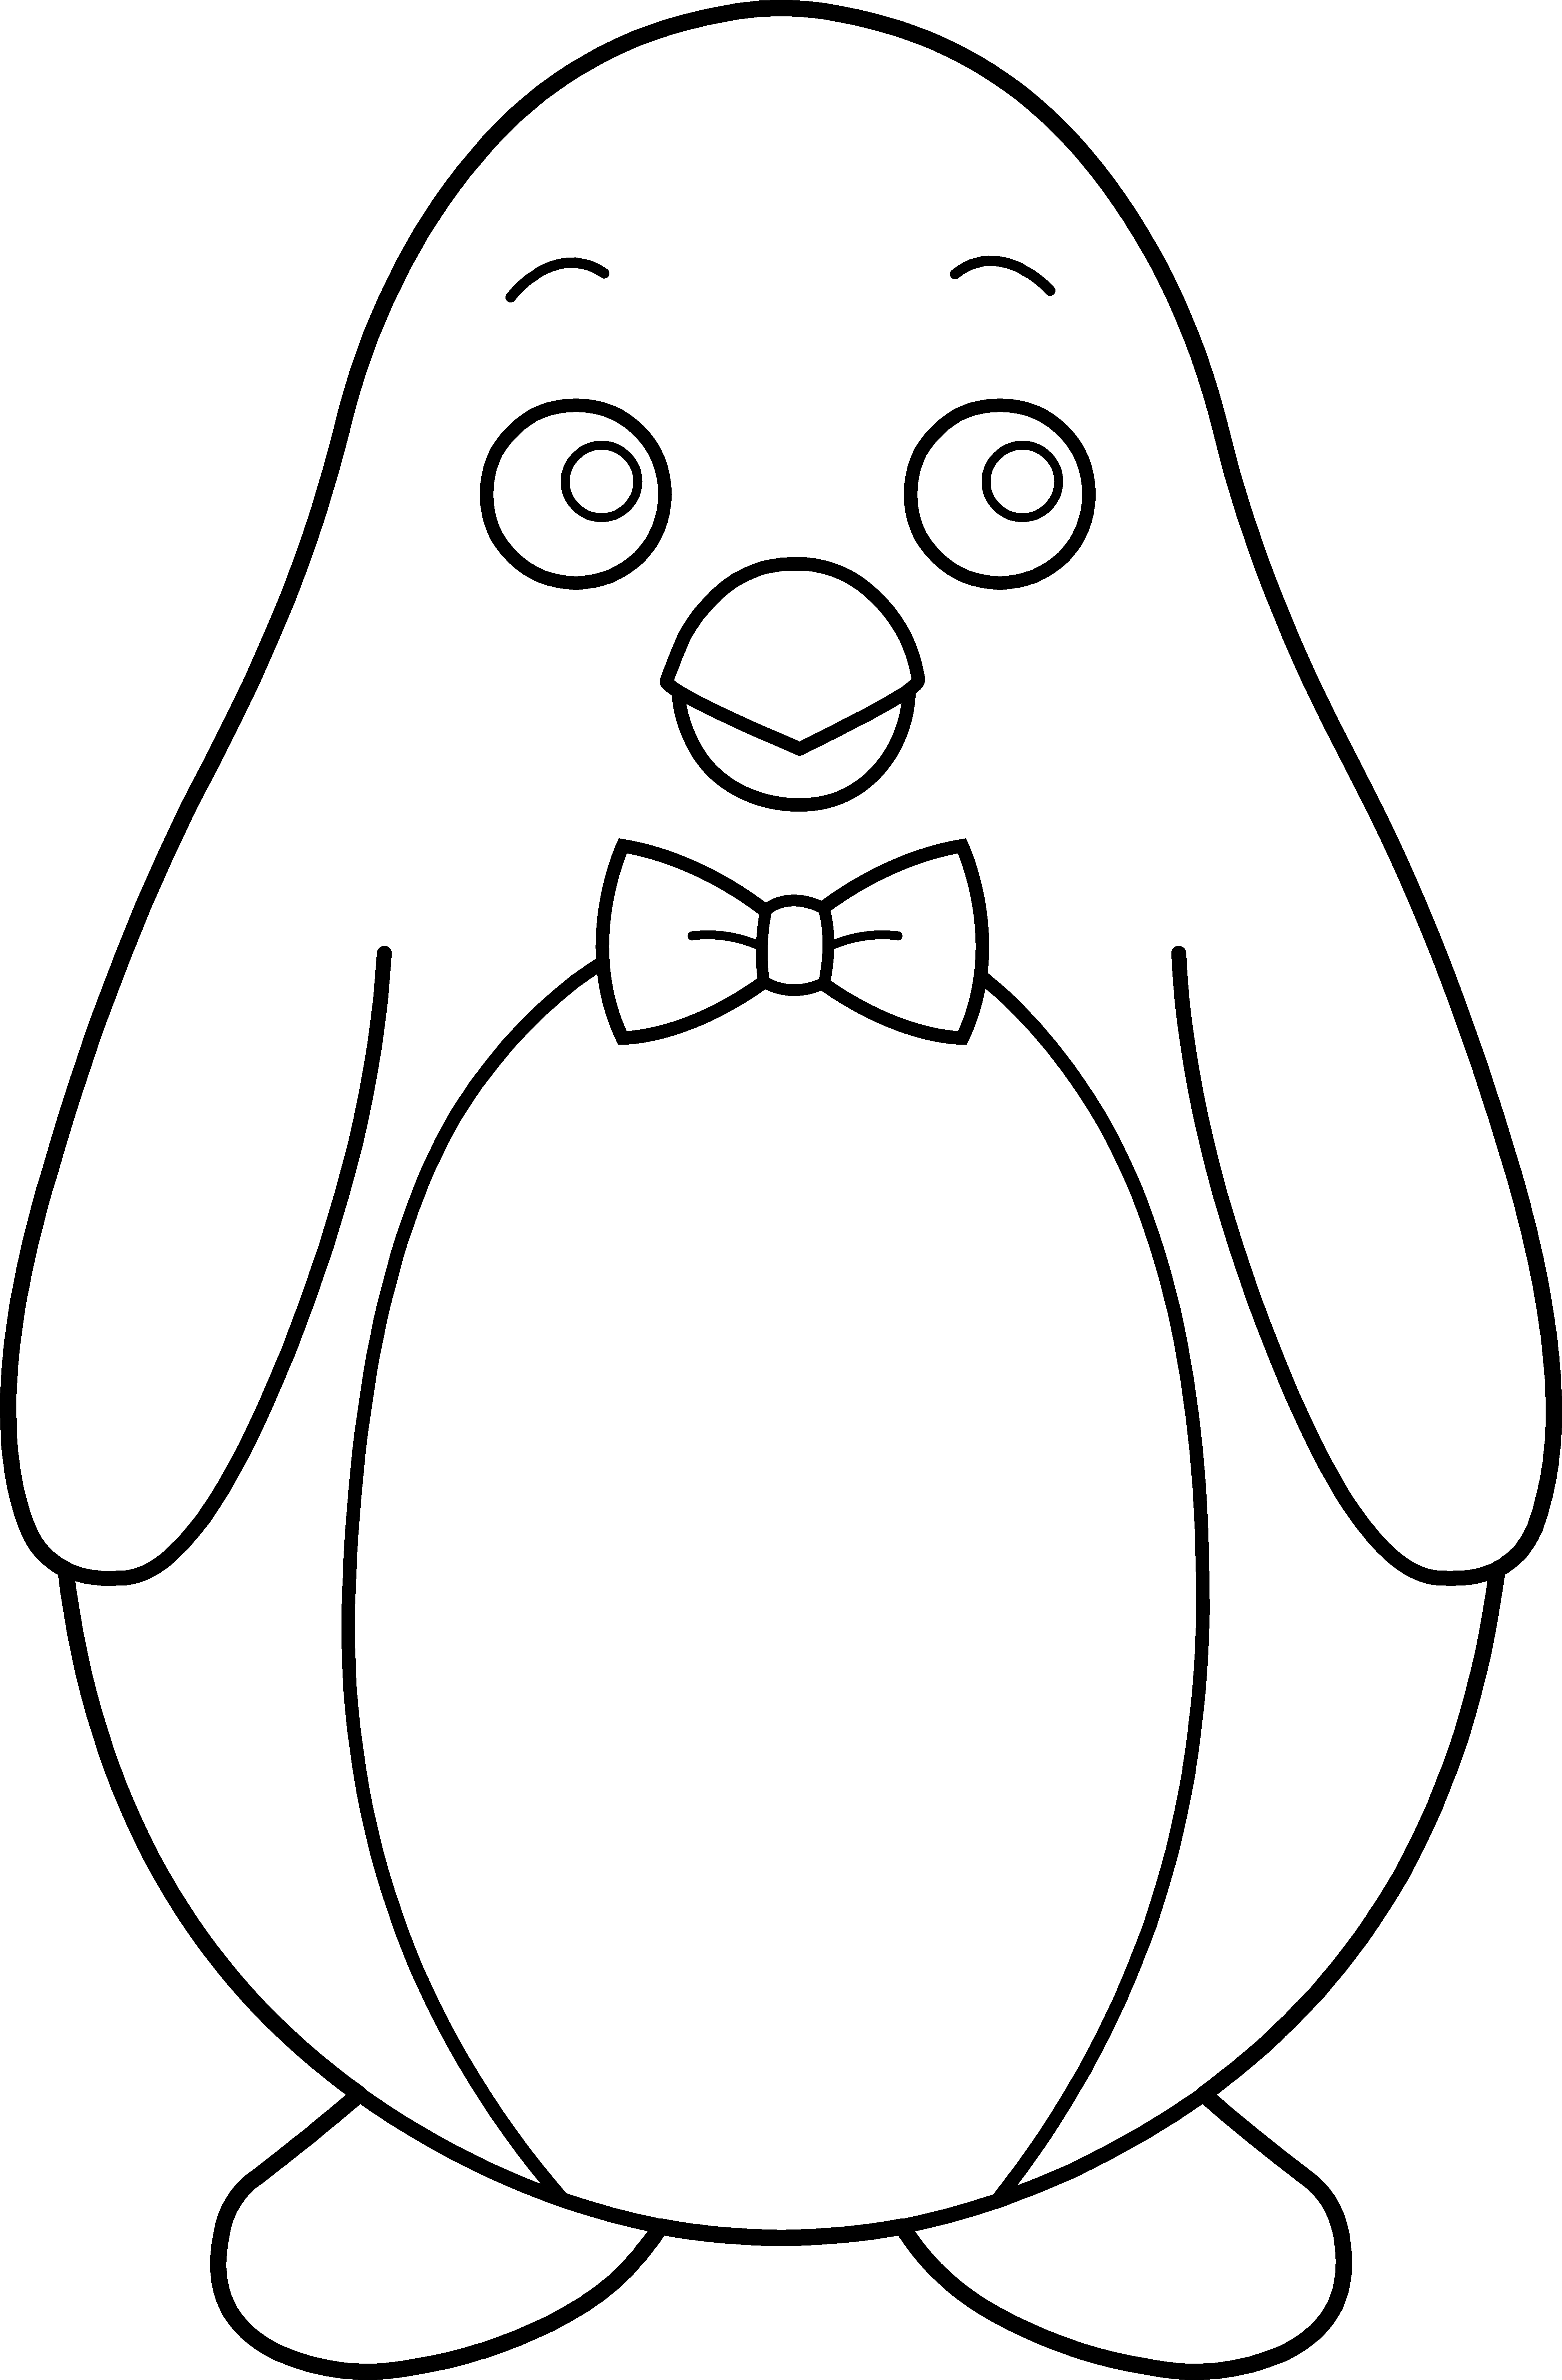 Coloring clipart tie. Necktie panda free images